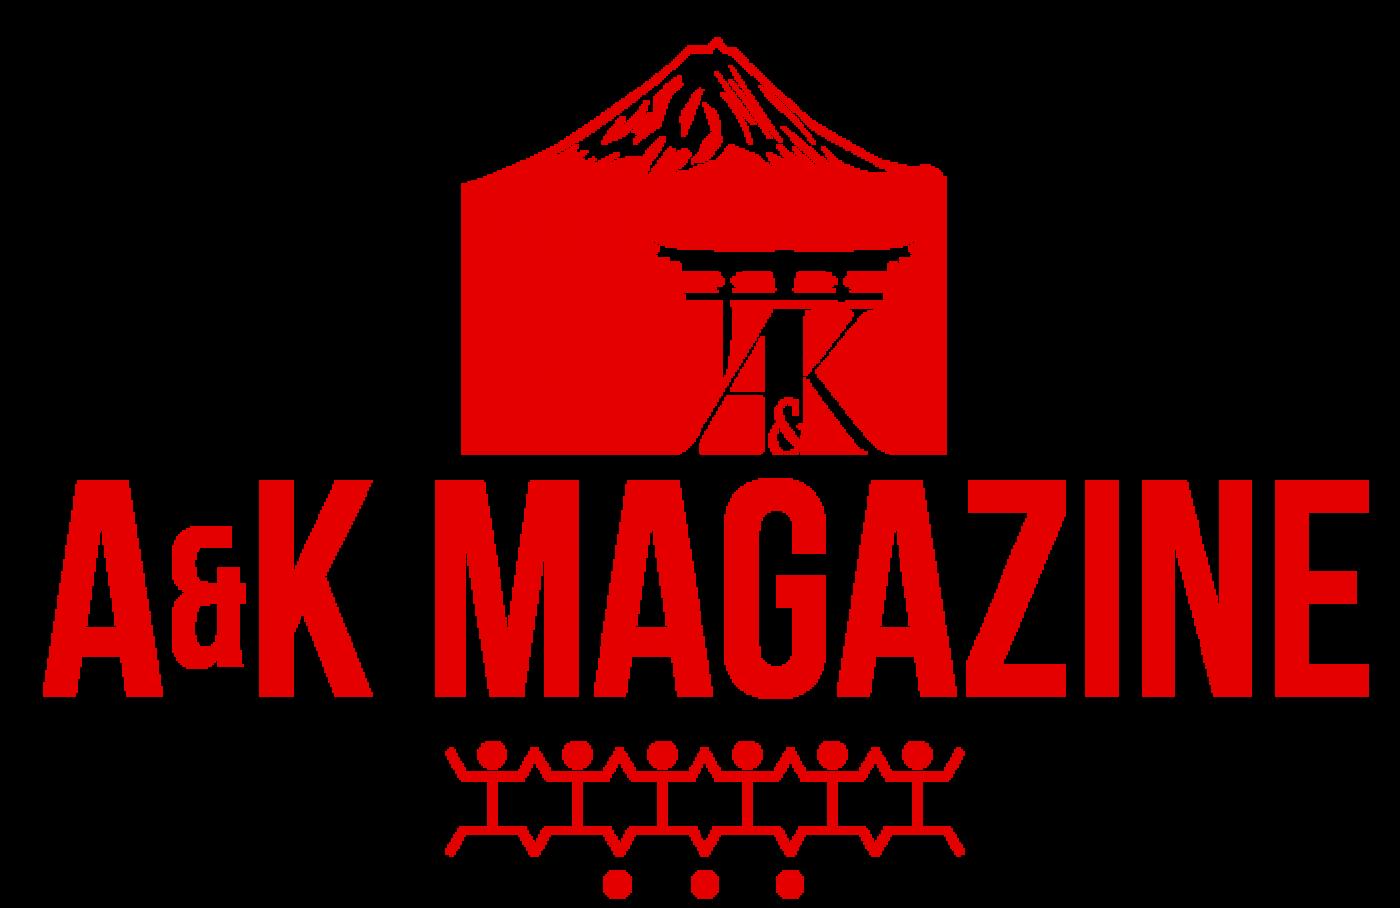 A&K Magazine